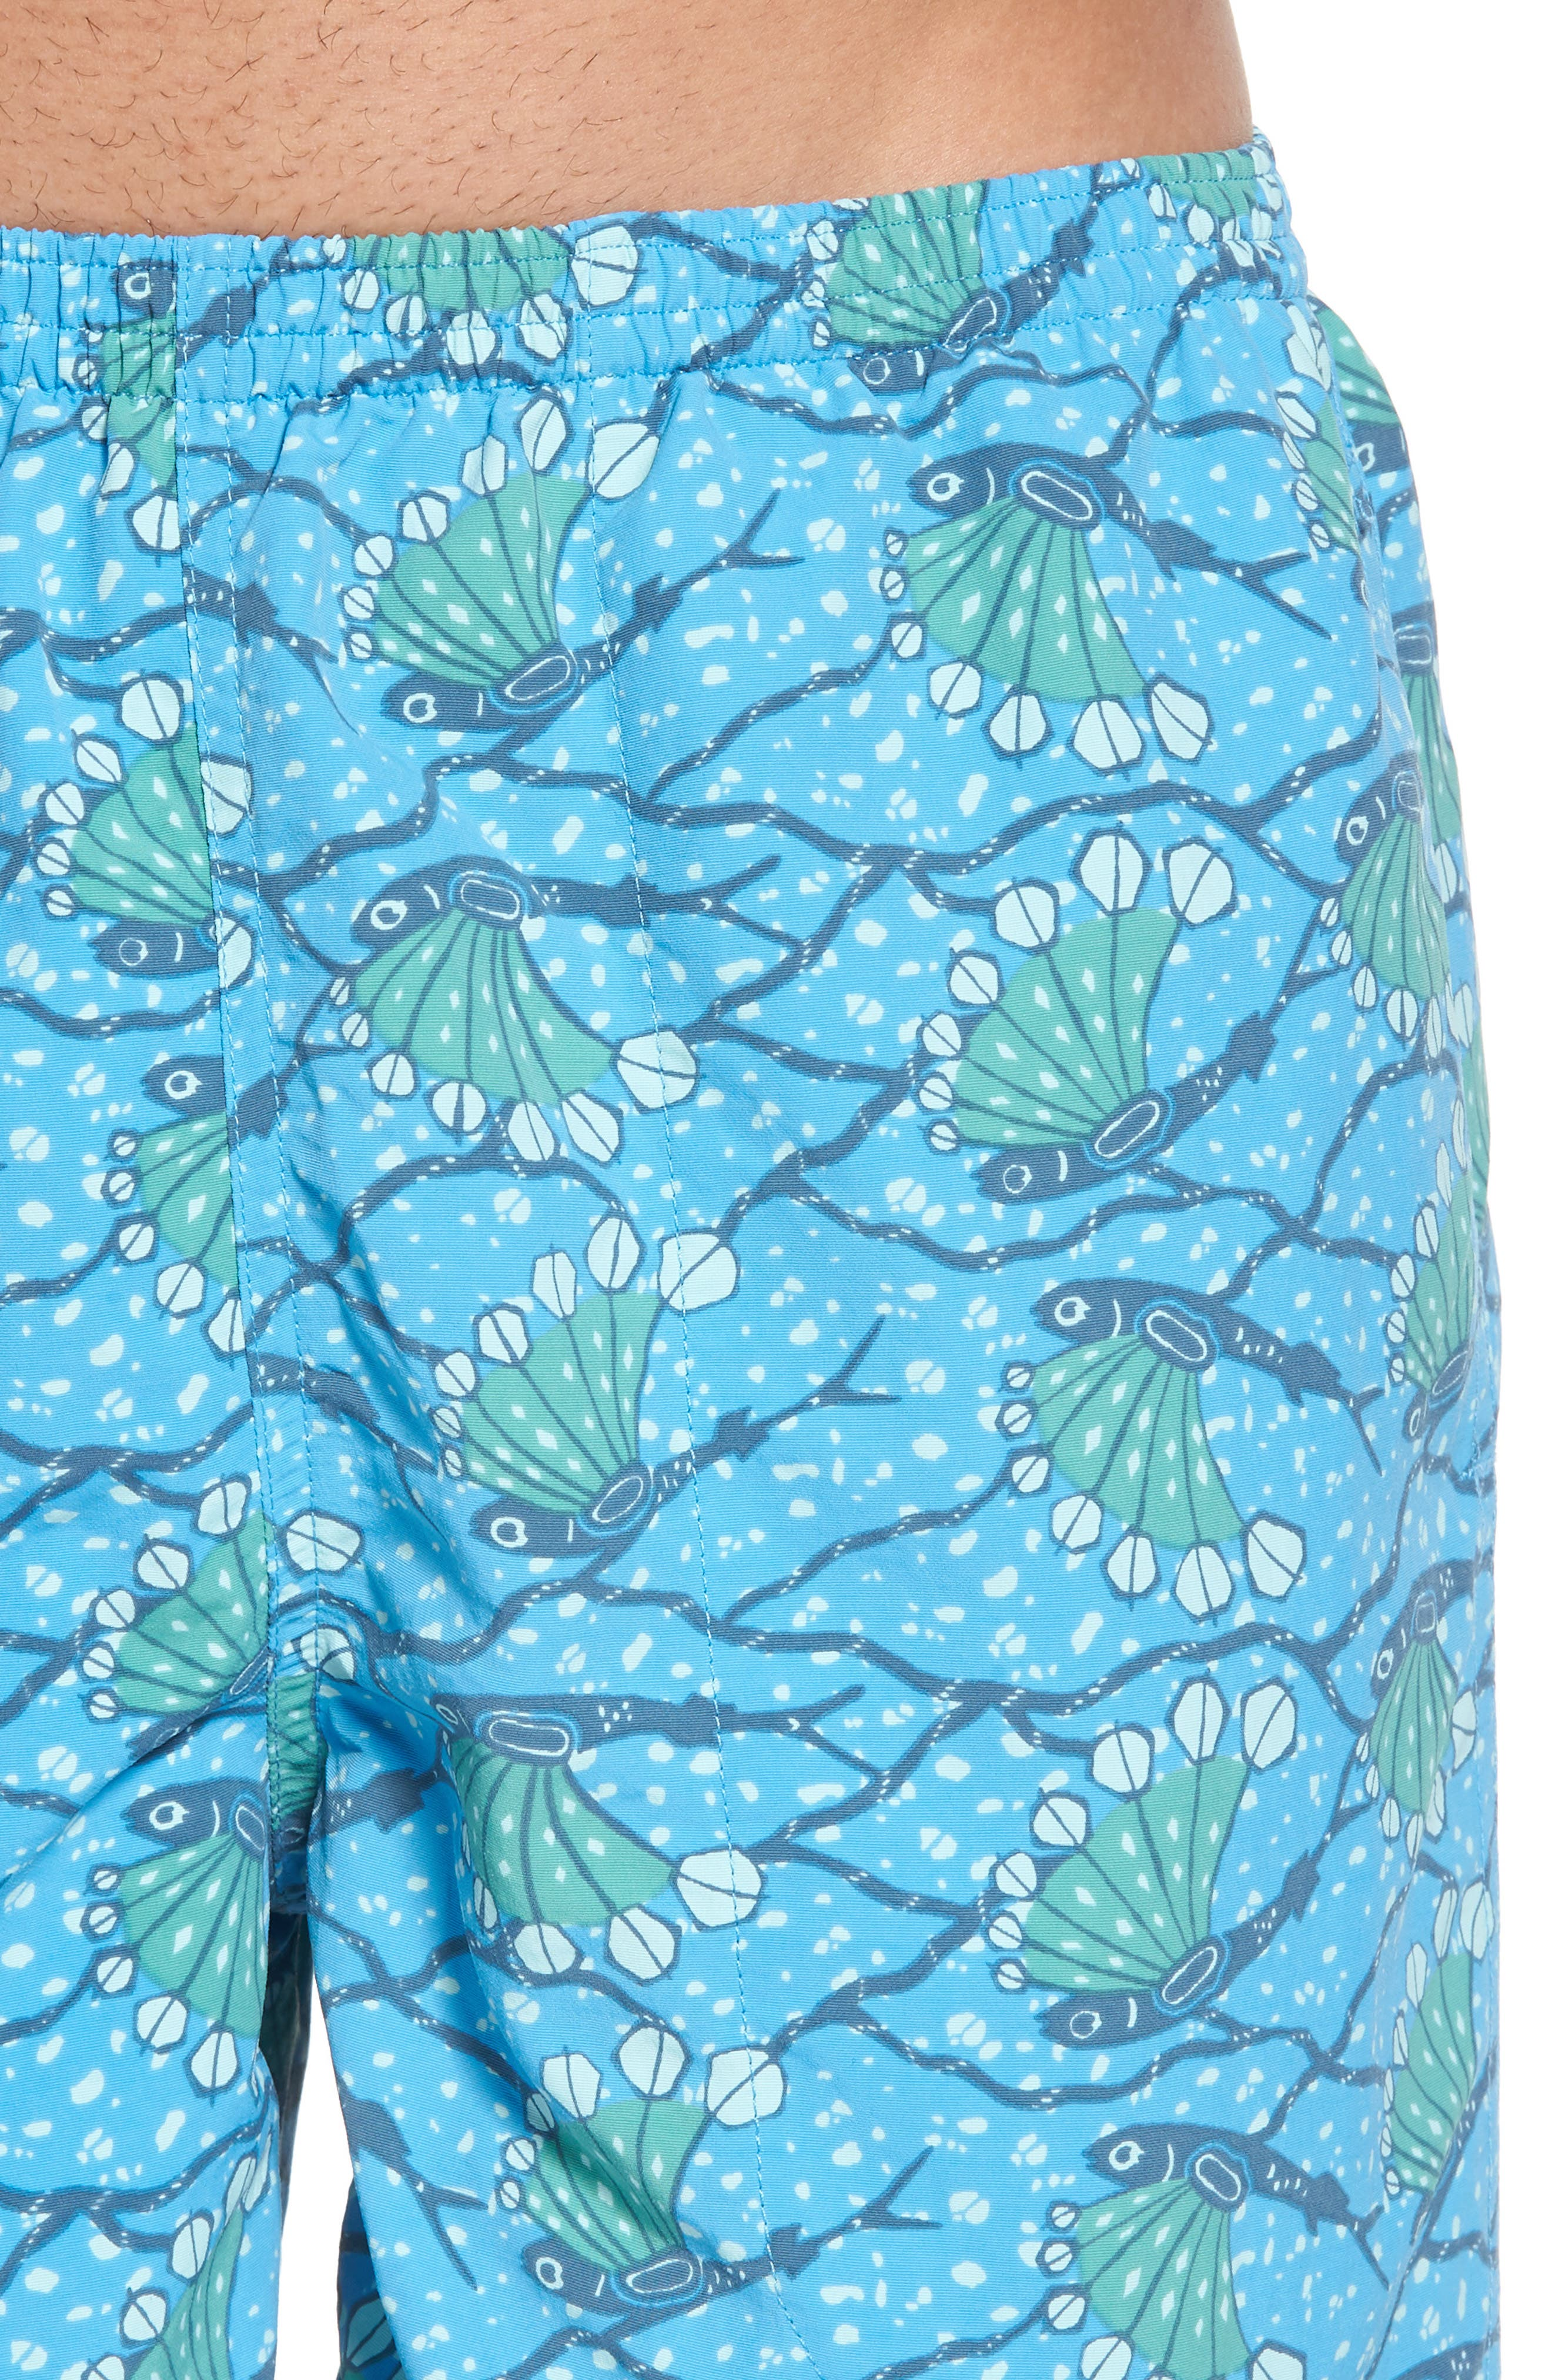 Baggies 5-Inch Swim Trunks,                             Alternate thumbnail 4, color,                             Hexy Fish Radar Blue